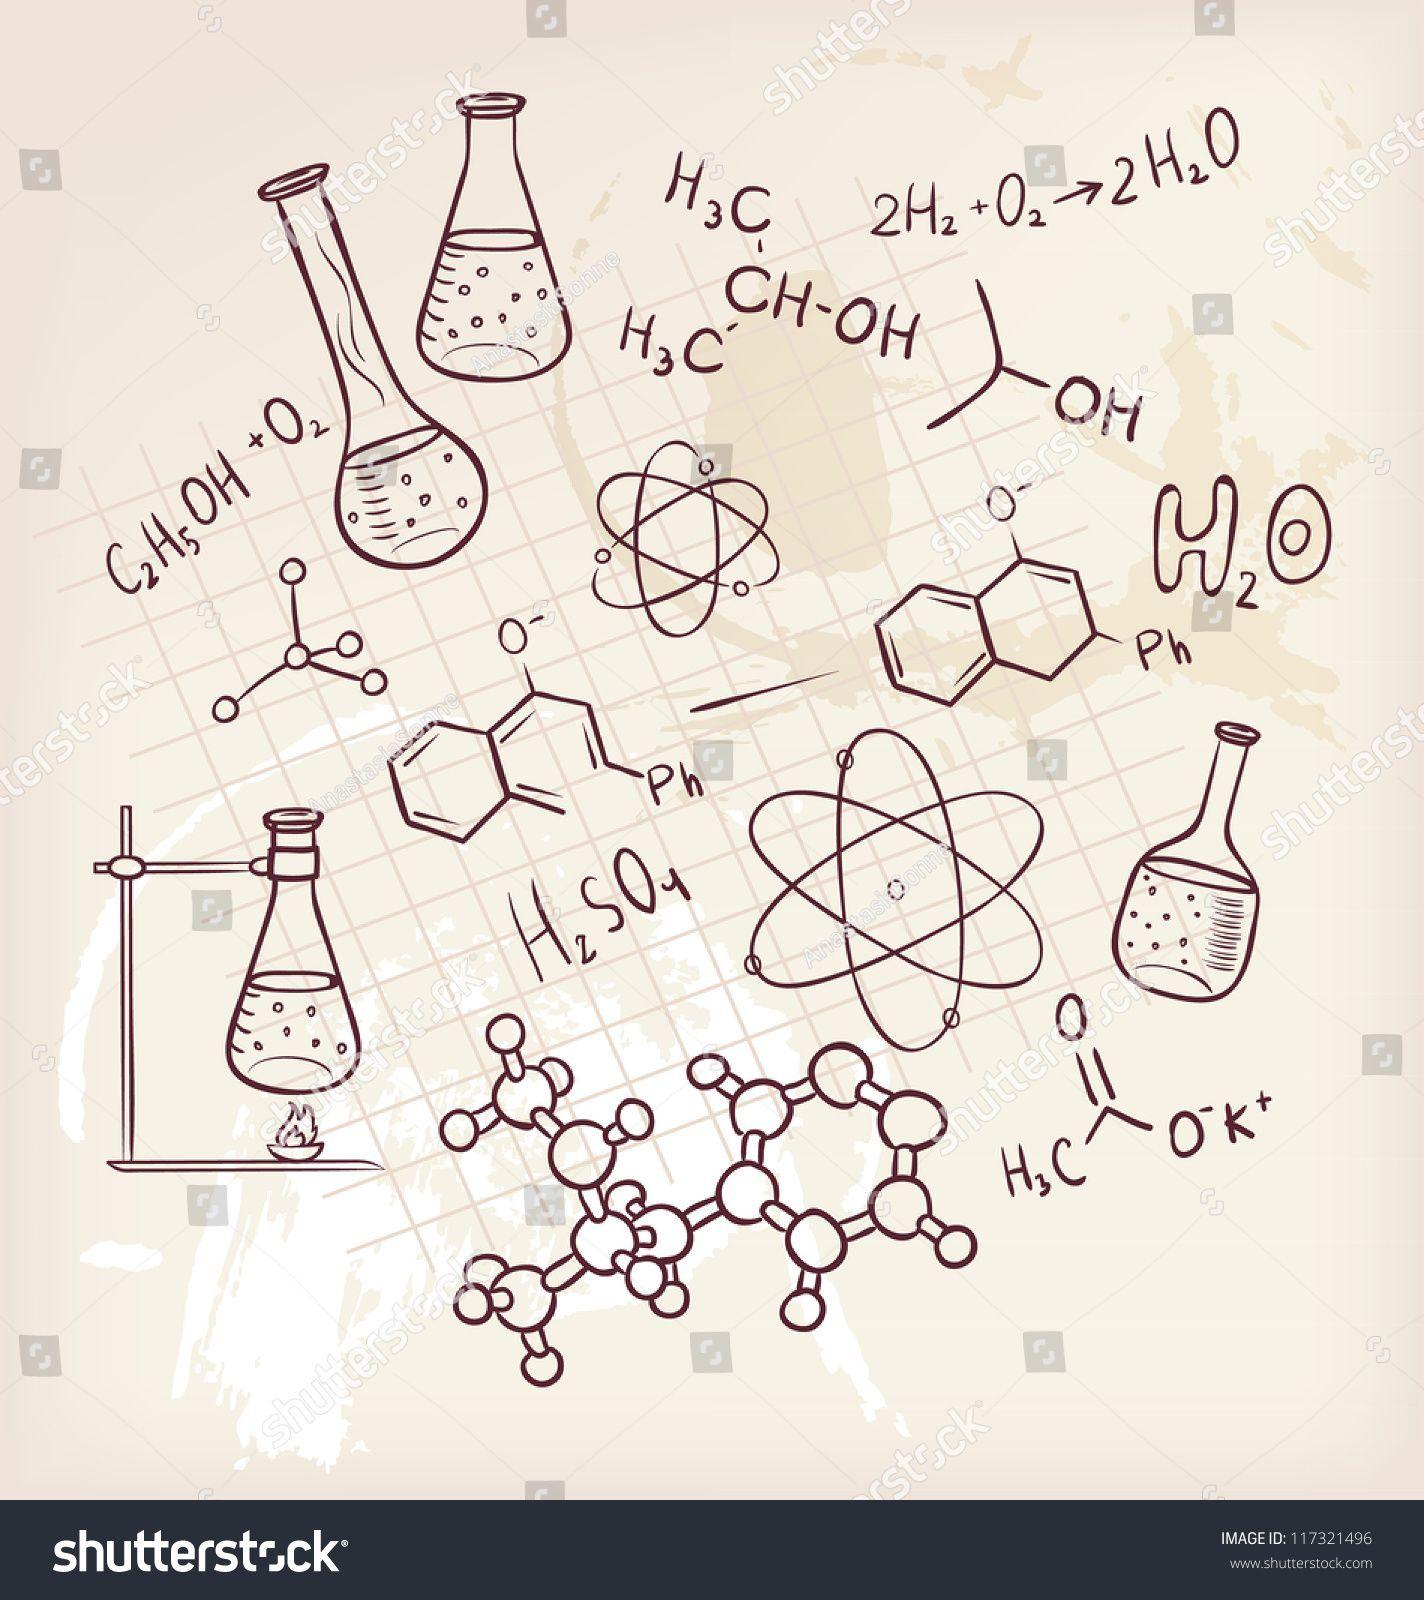 Vector Illustration Hand Draw Chemistry On Stock Vector Royalty ...